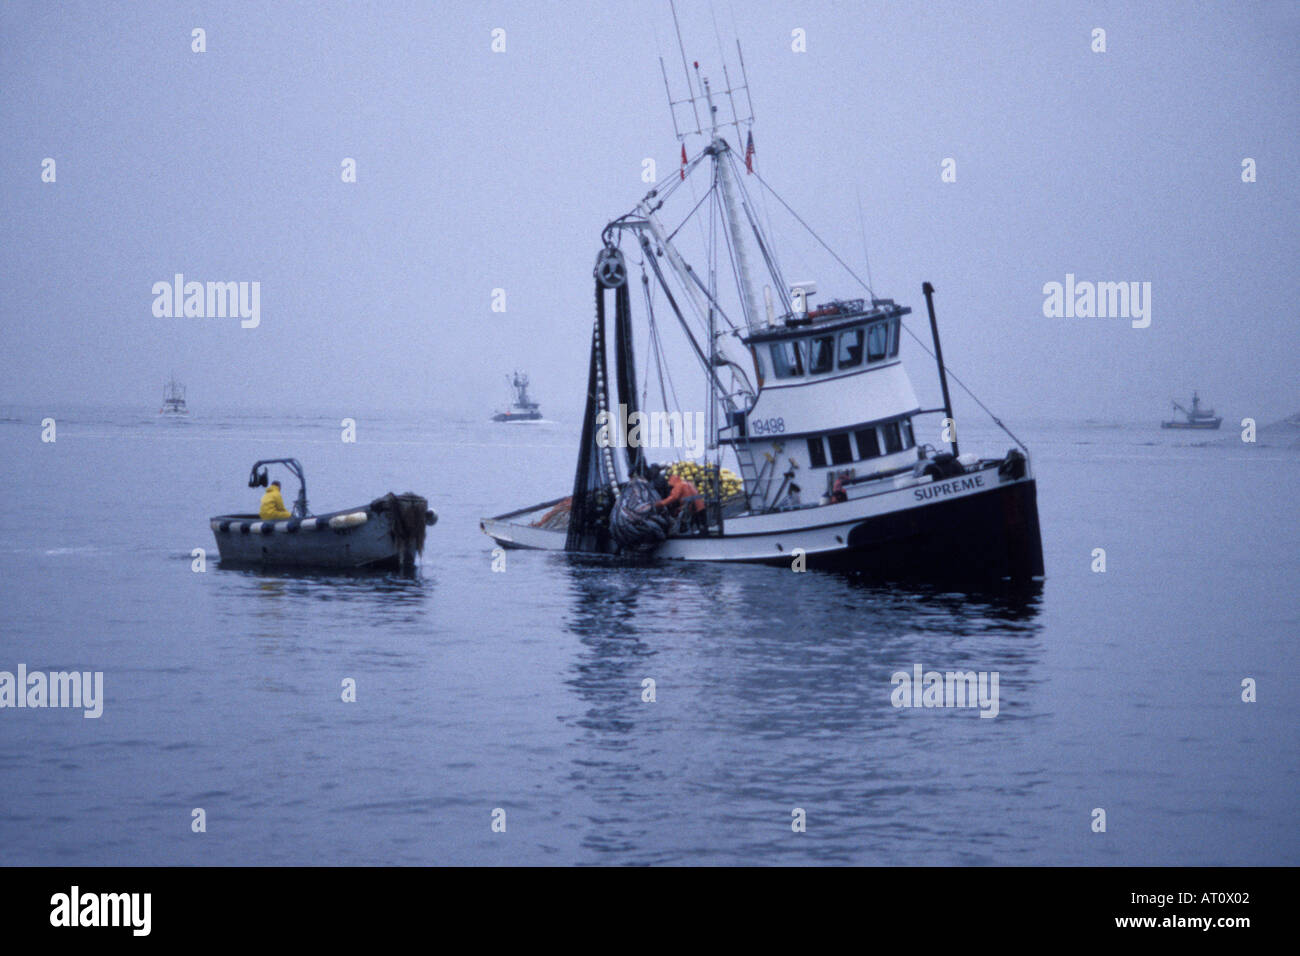 commercial fishing vessel supreme crew pull in sien gear full of, Reel Combo